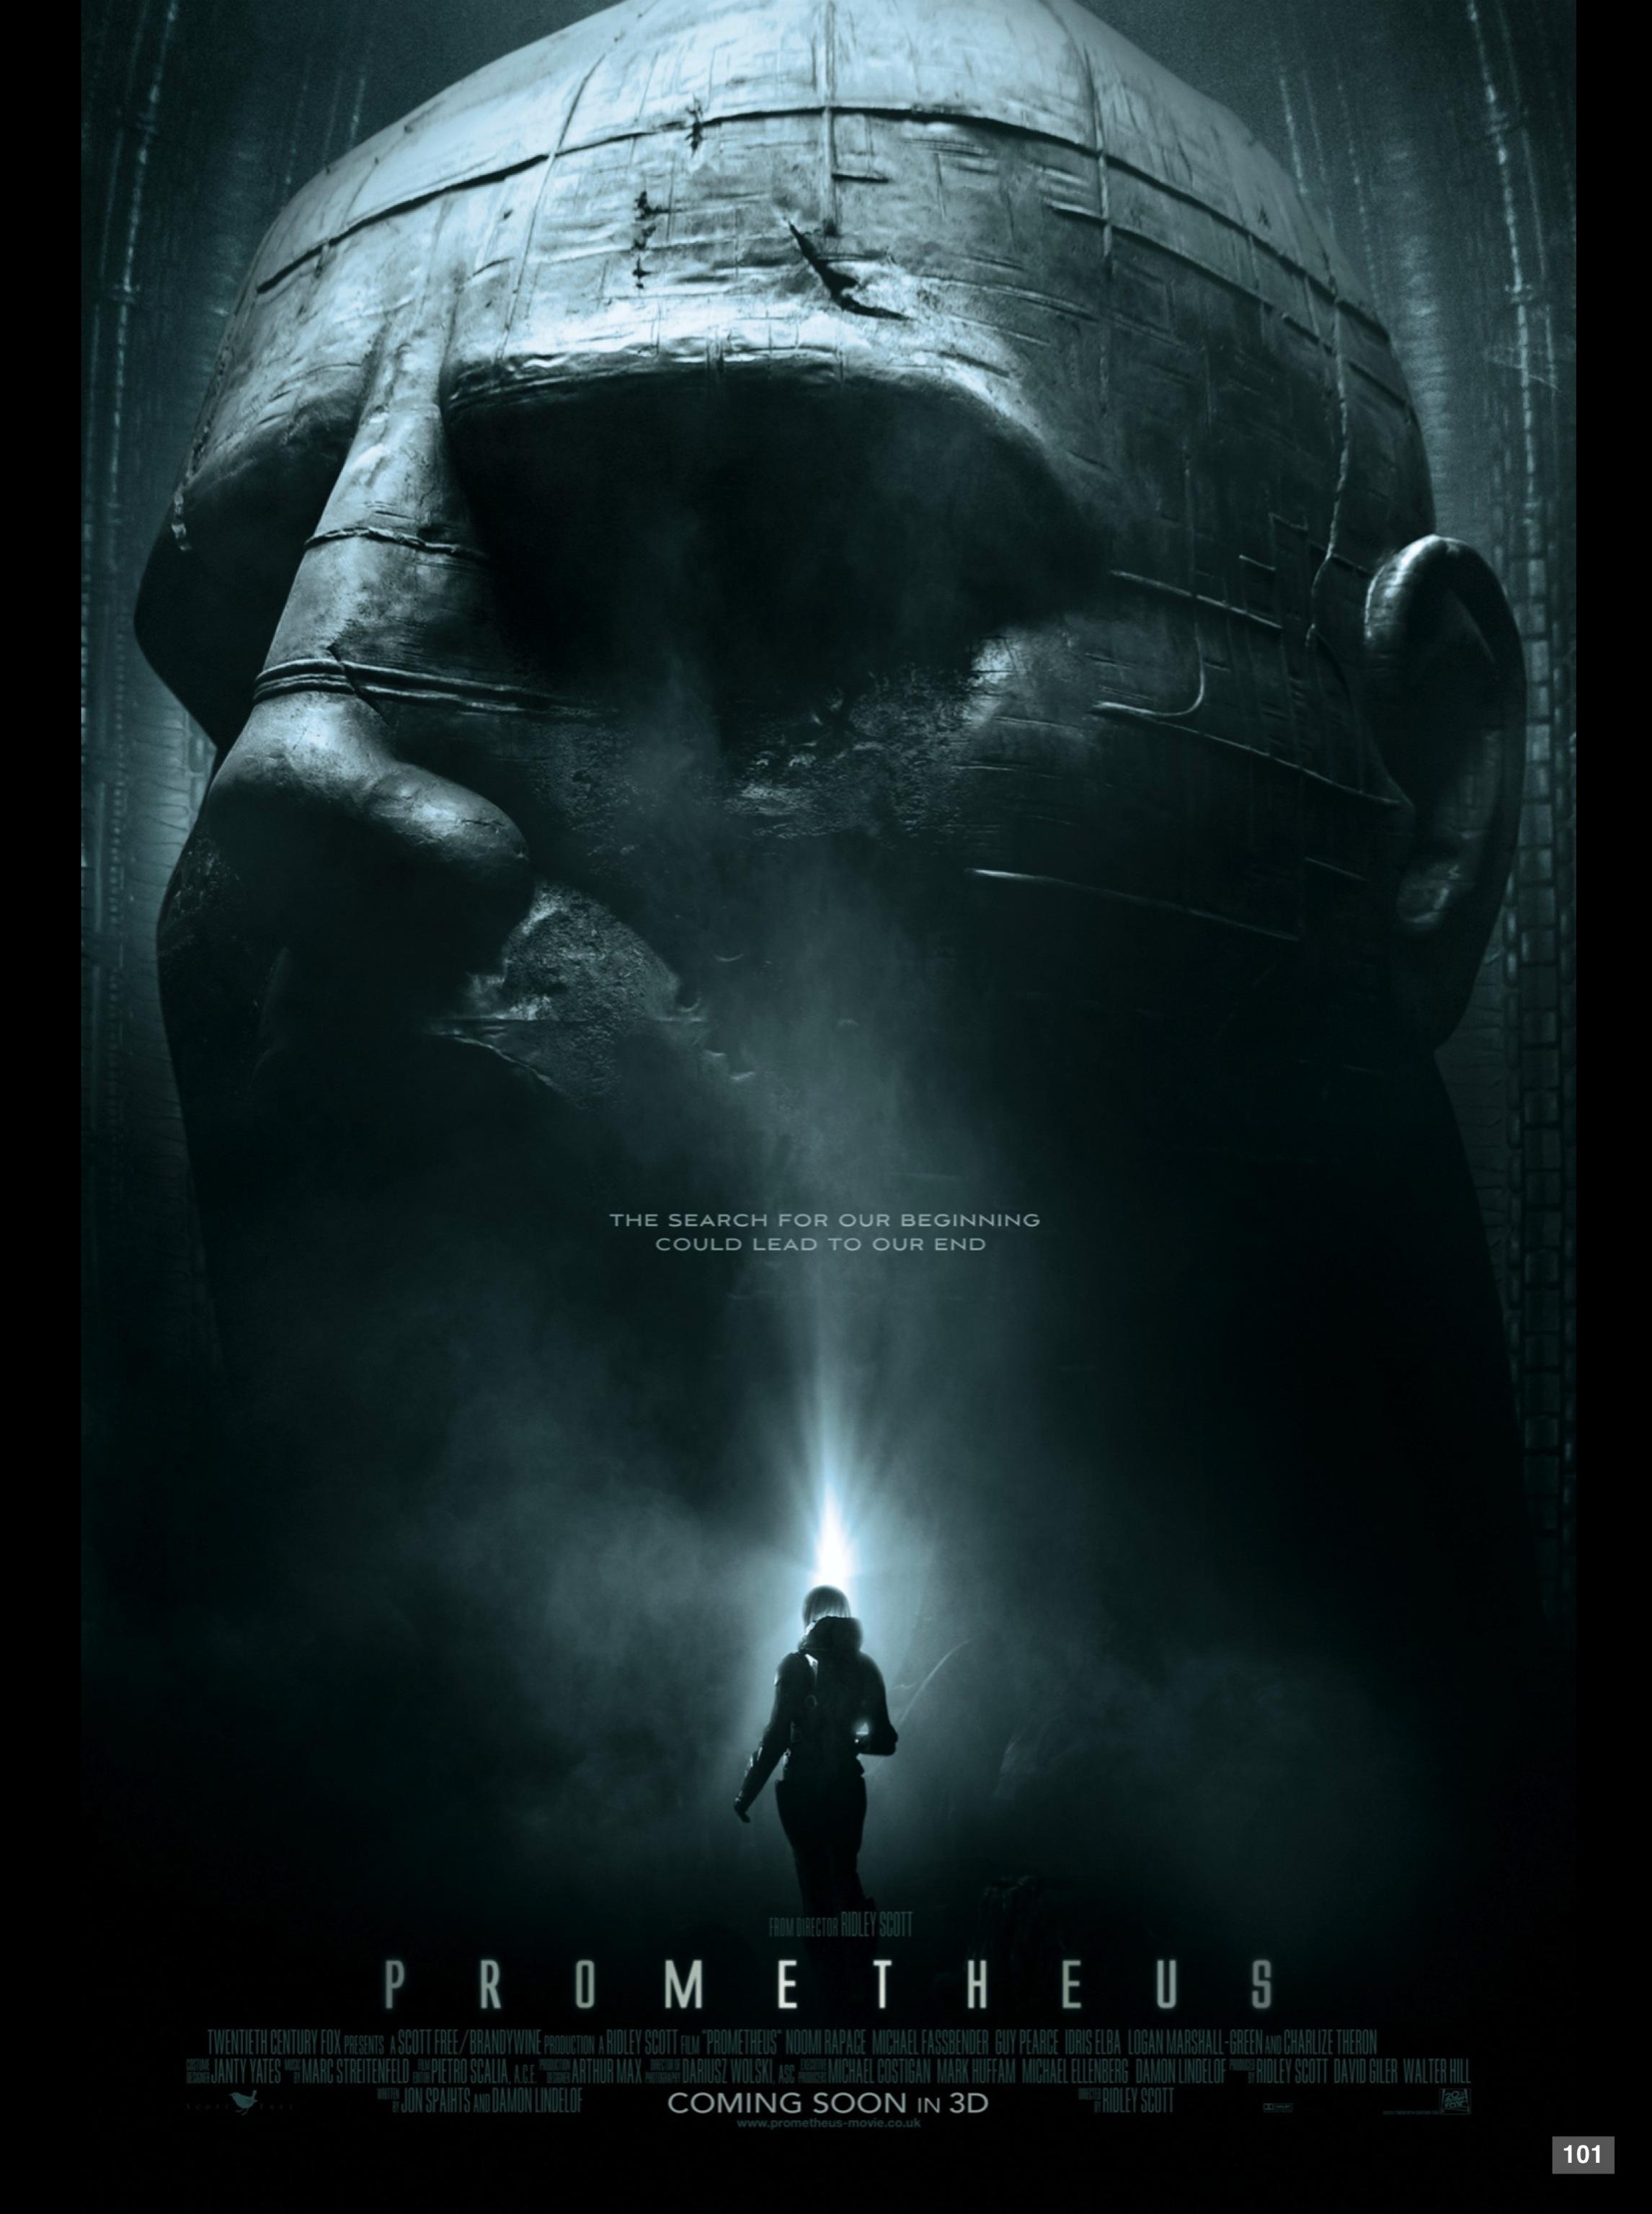 Prometheus UK Poster